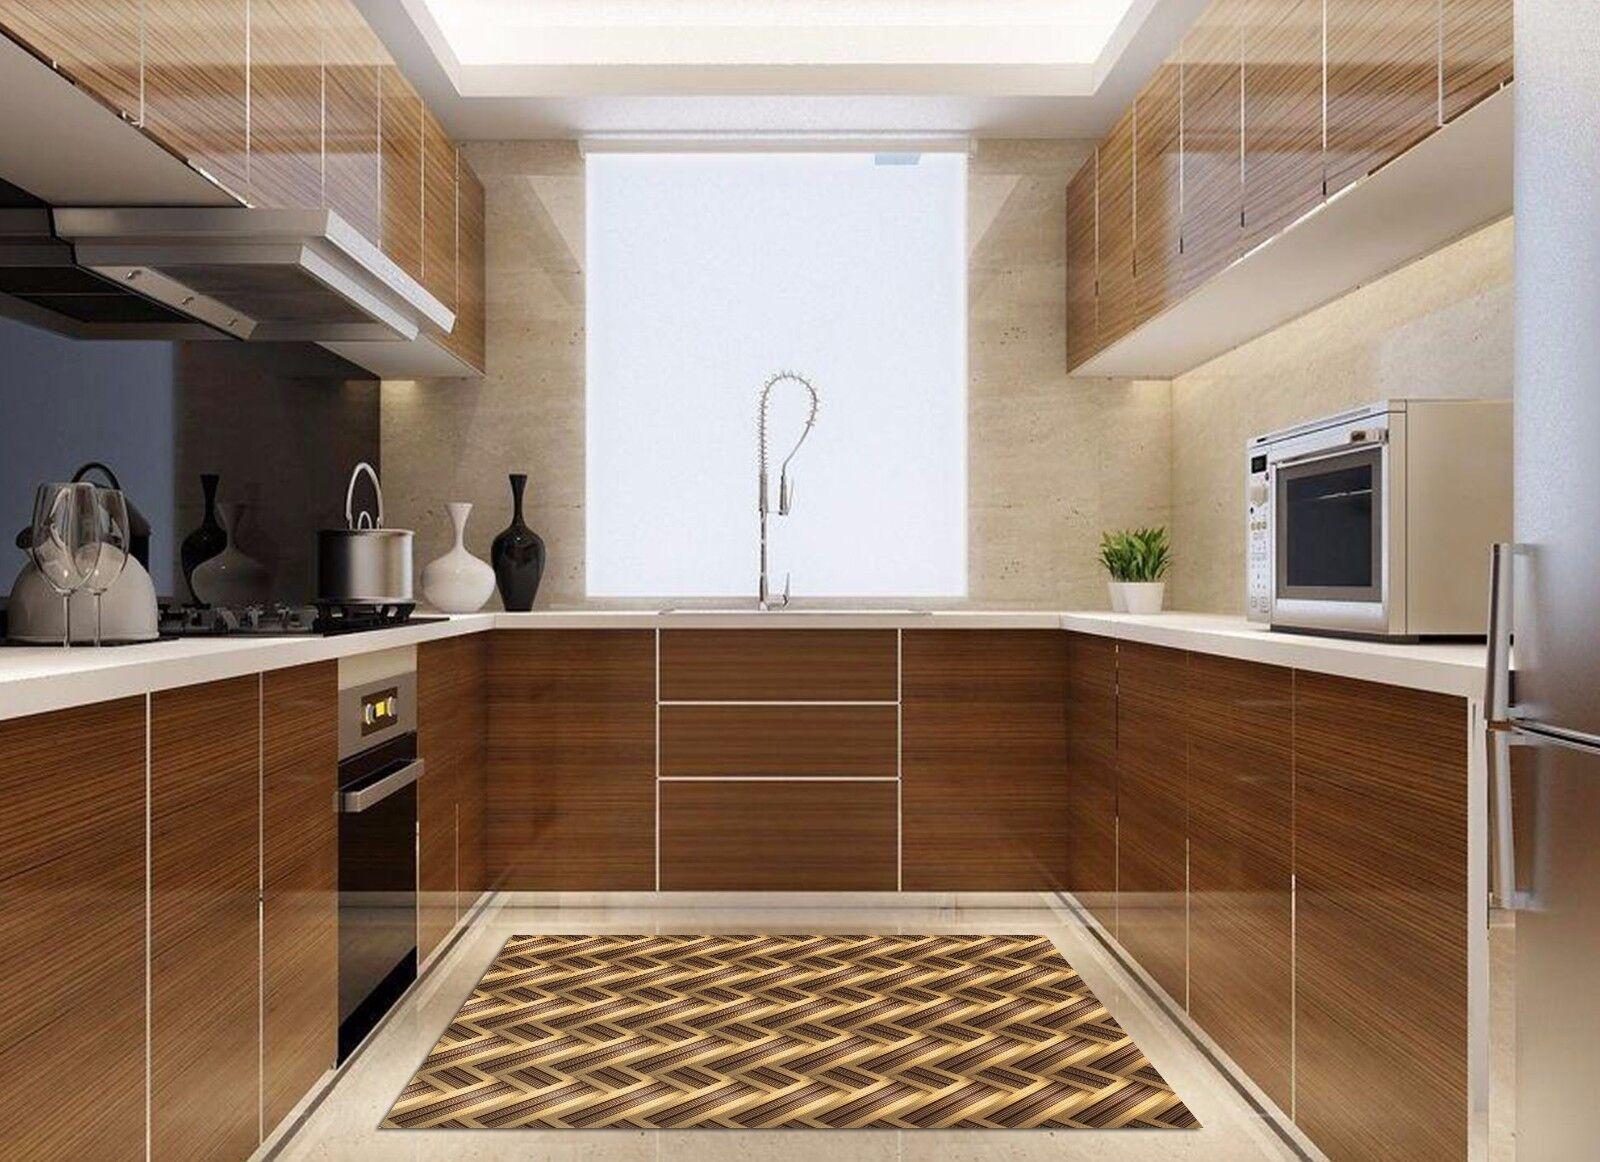 3D Ripple 62 Kitchen Mat Floor Murals Wall Print Wall AJ WALLPAPER UK Kyra